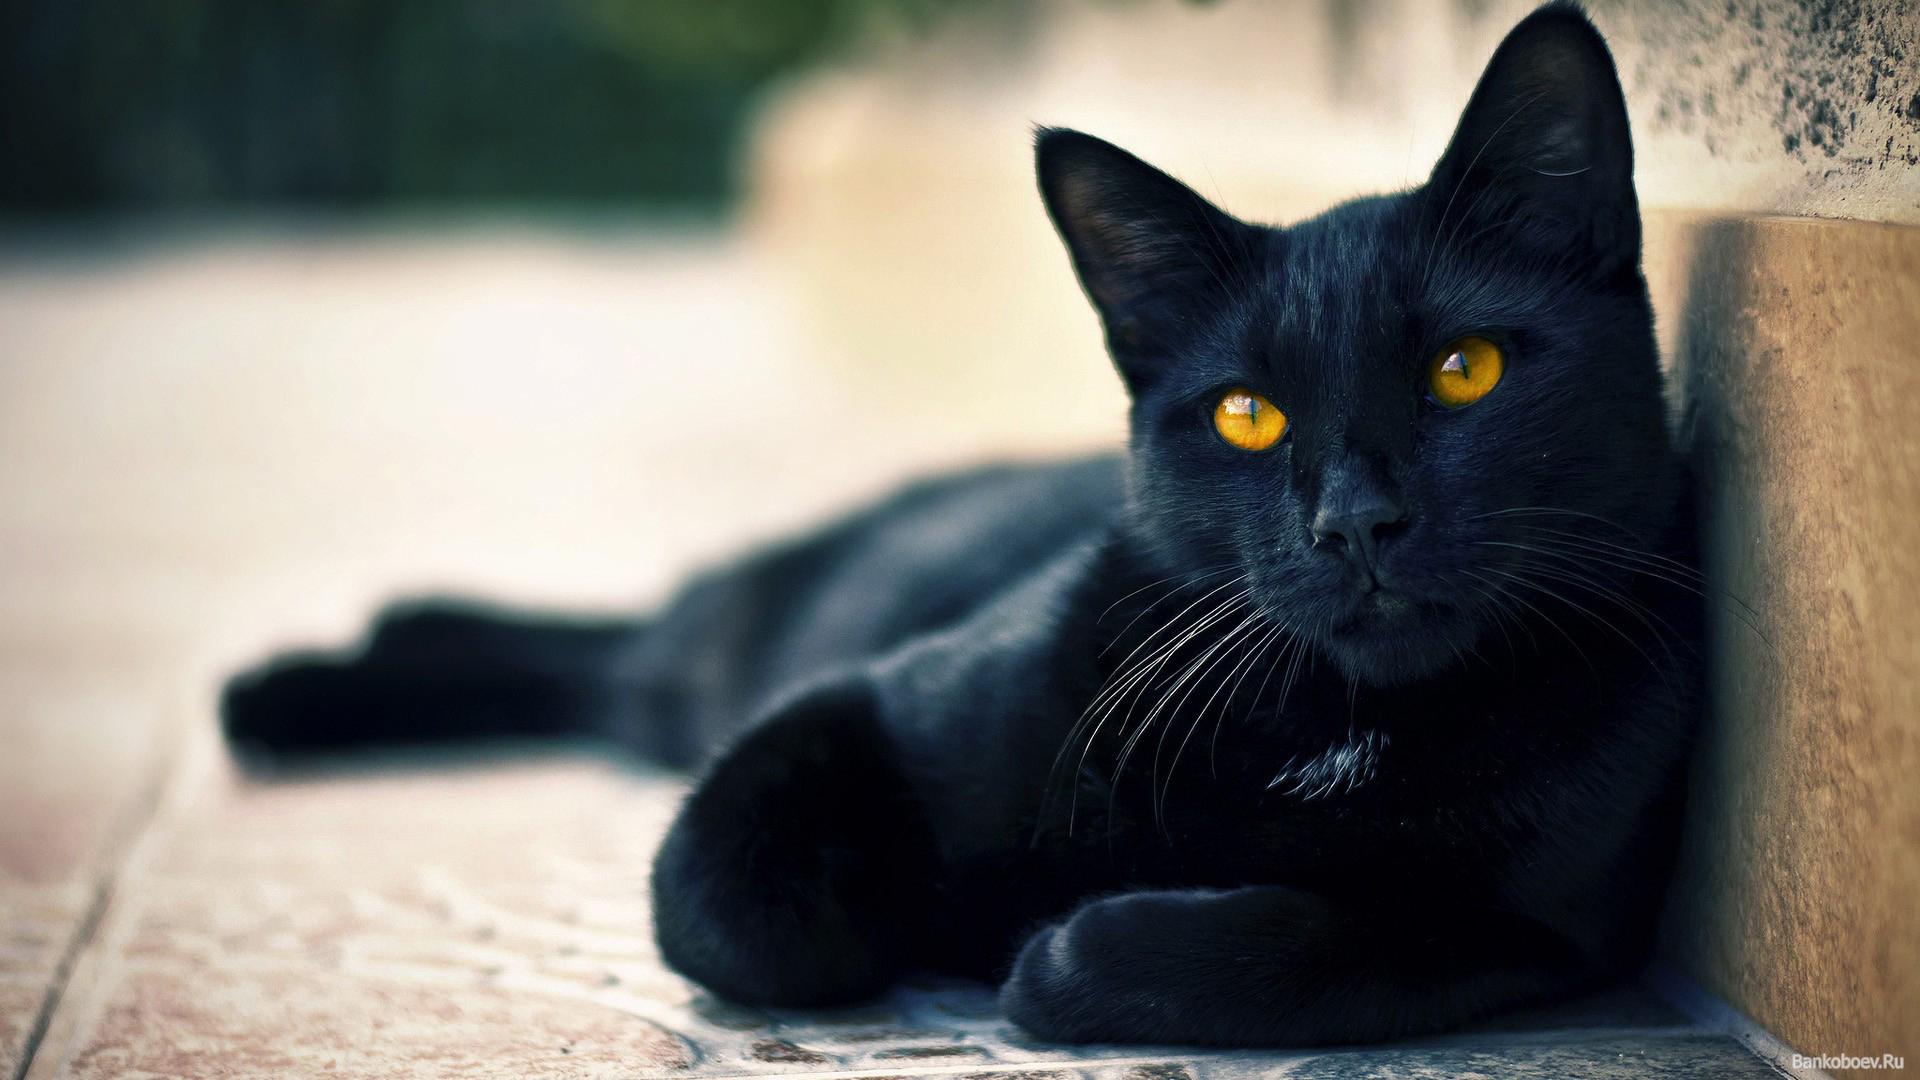 Характер и окрас котов